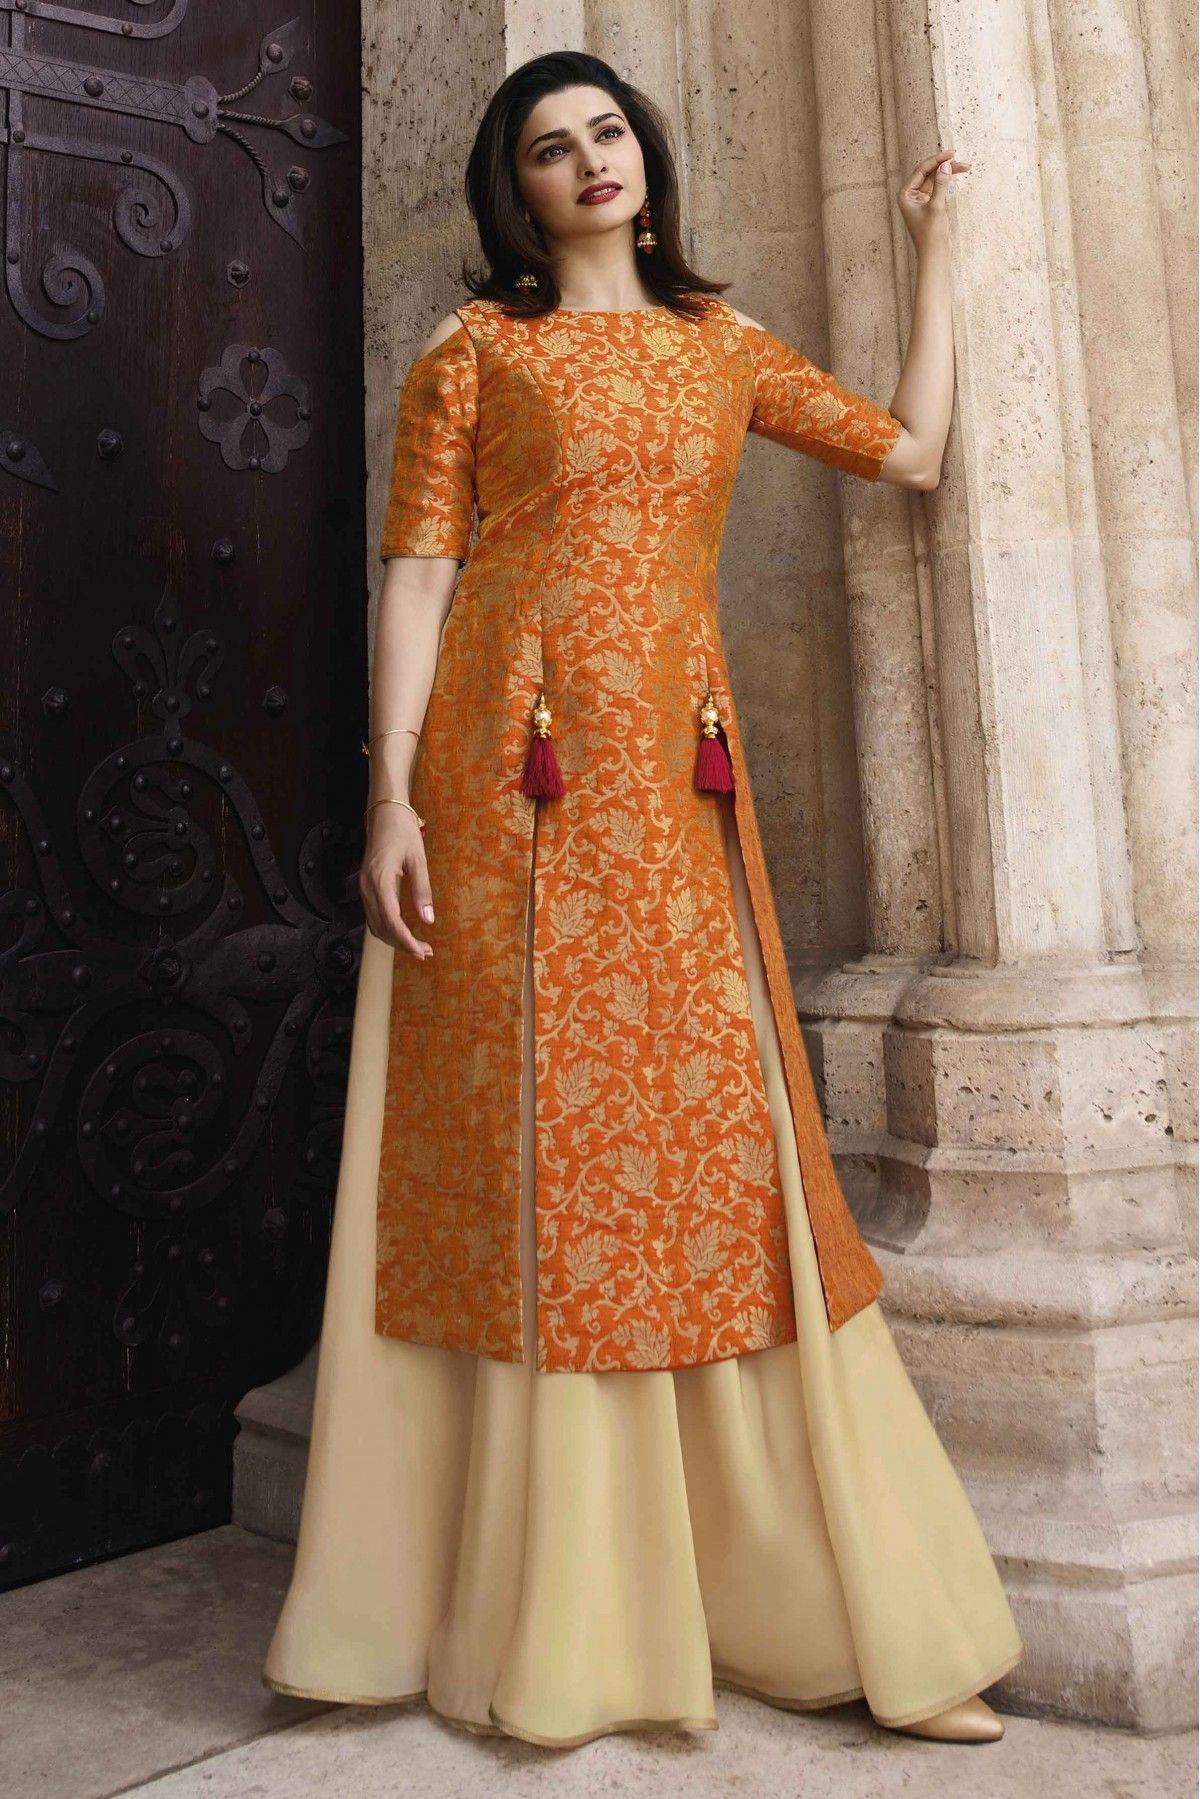 00813654a043e Prachi Desai Banarasi Jacquard And Satin Woven Kurti In Orange And ...